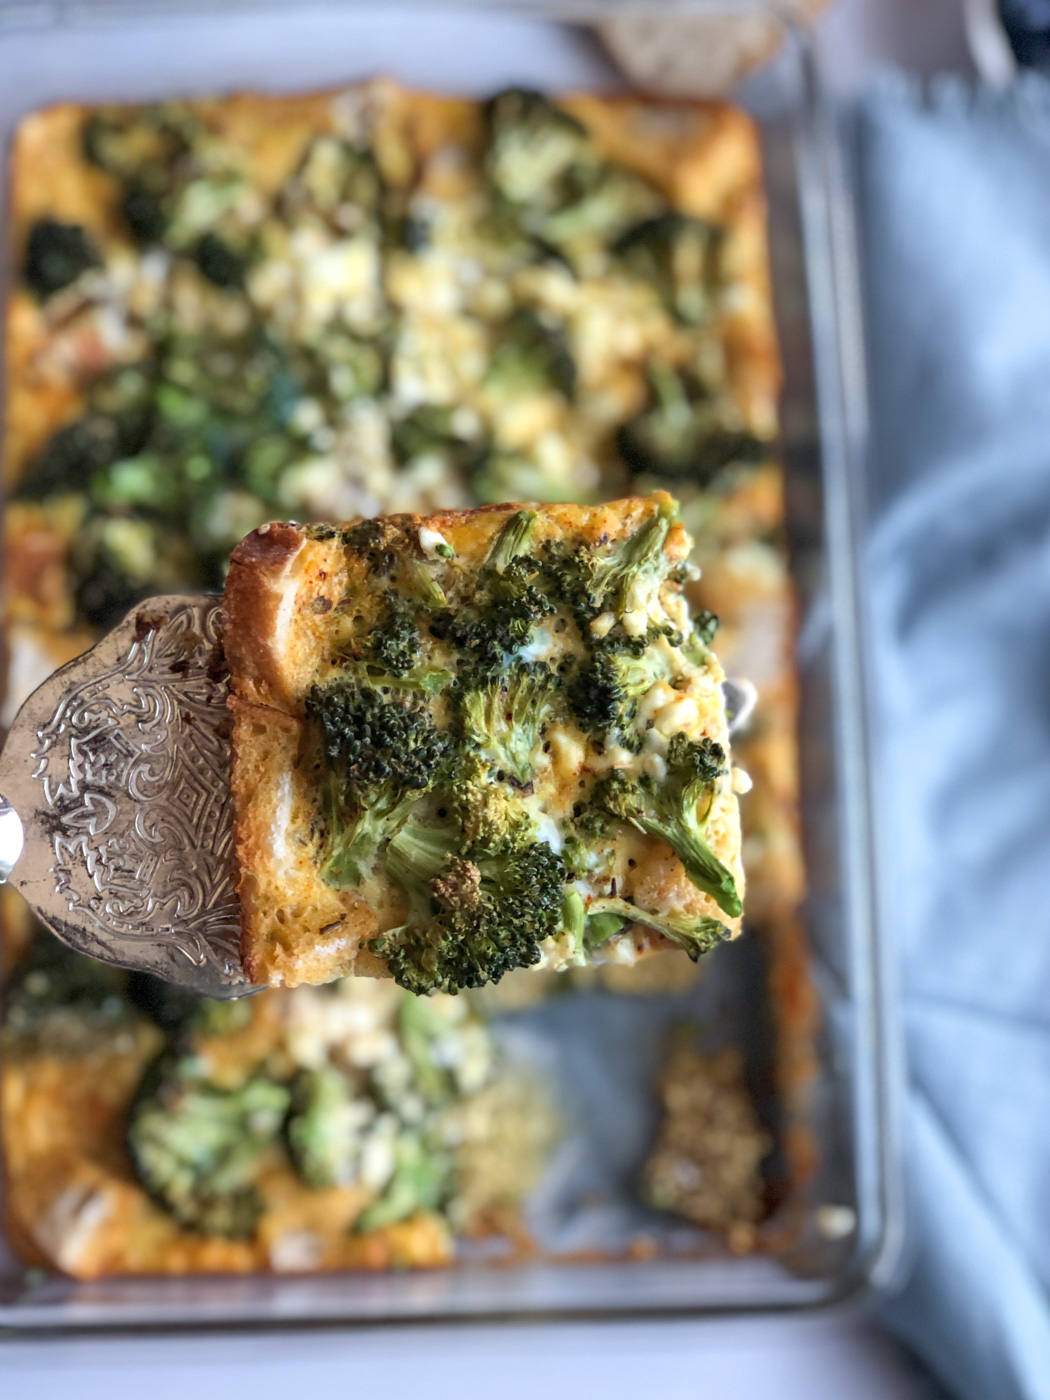 Healthy Overnight Broccoli and Egg Breakfast Casserole